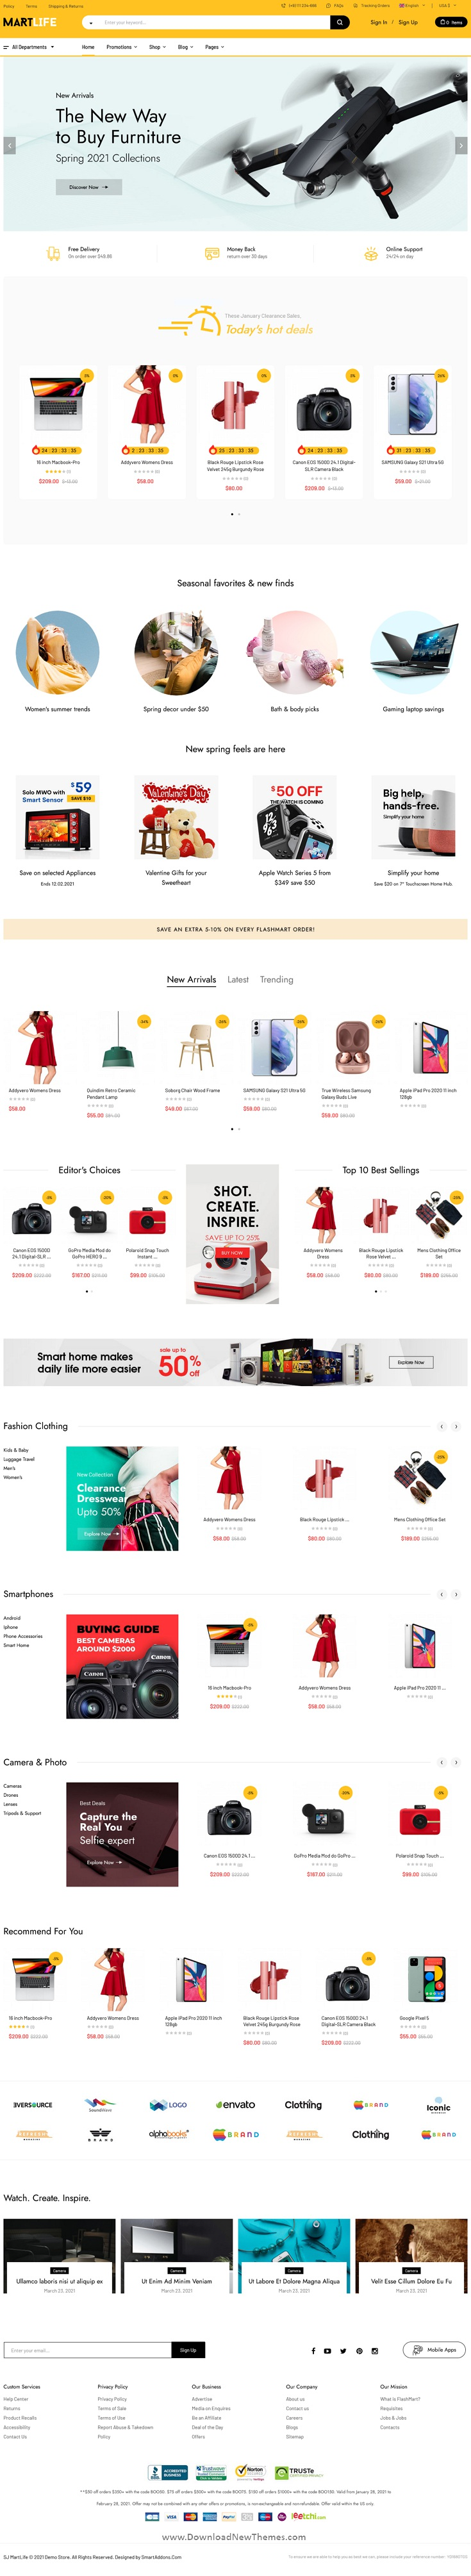 MartLife - Responsive Multipurpose eCommerce Joomla Template